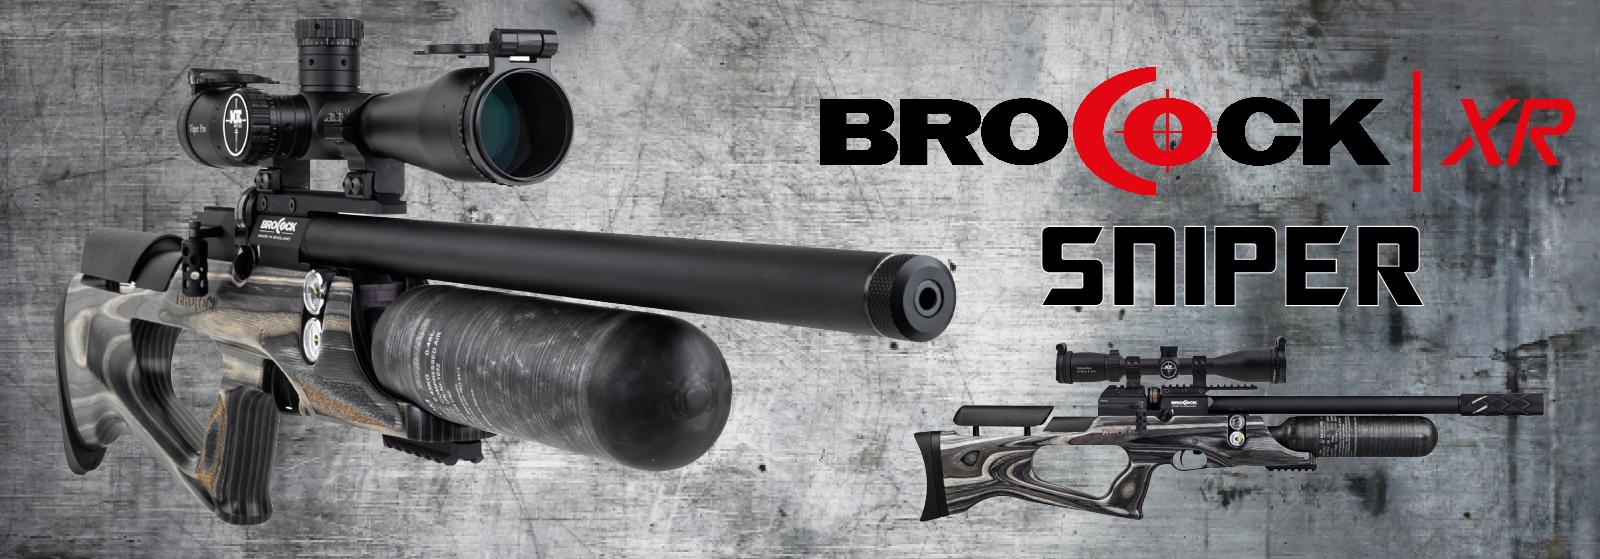 Brocock XR Sniper Laminate Carbon PCP-Luftgevær hos AIRGUN.dk